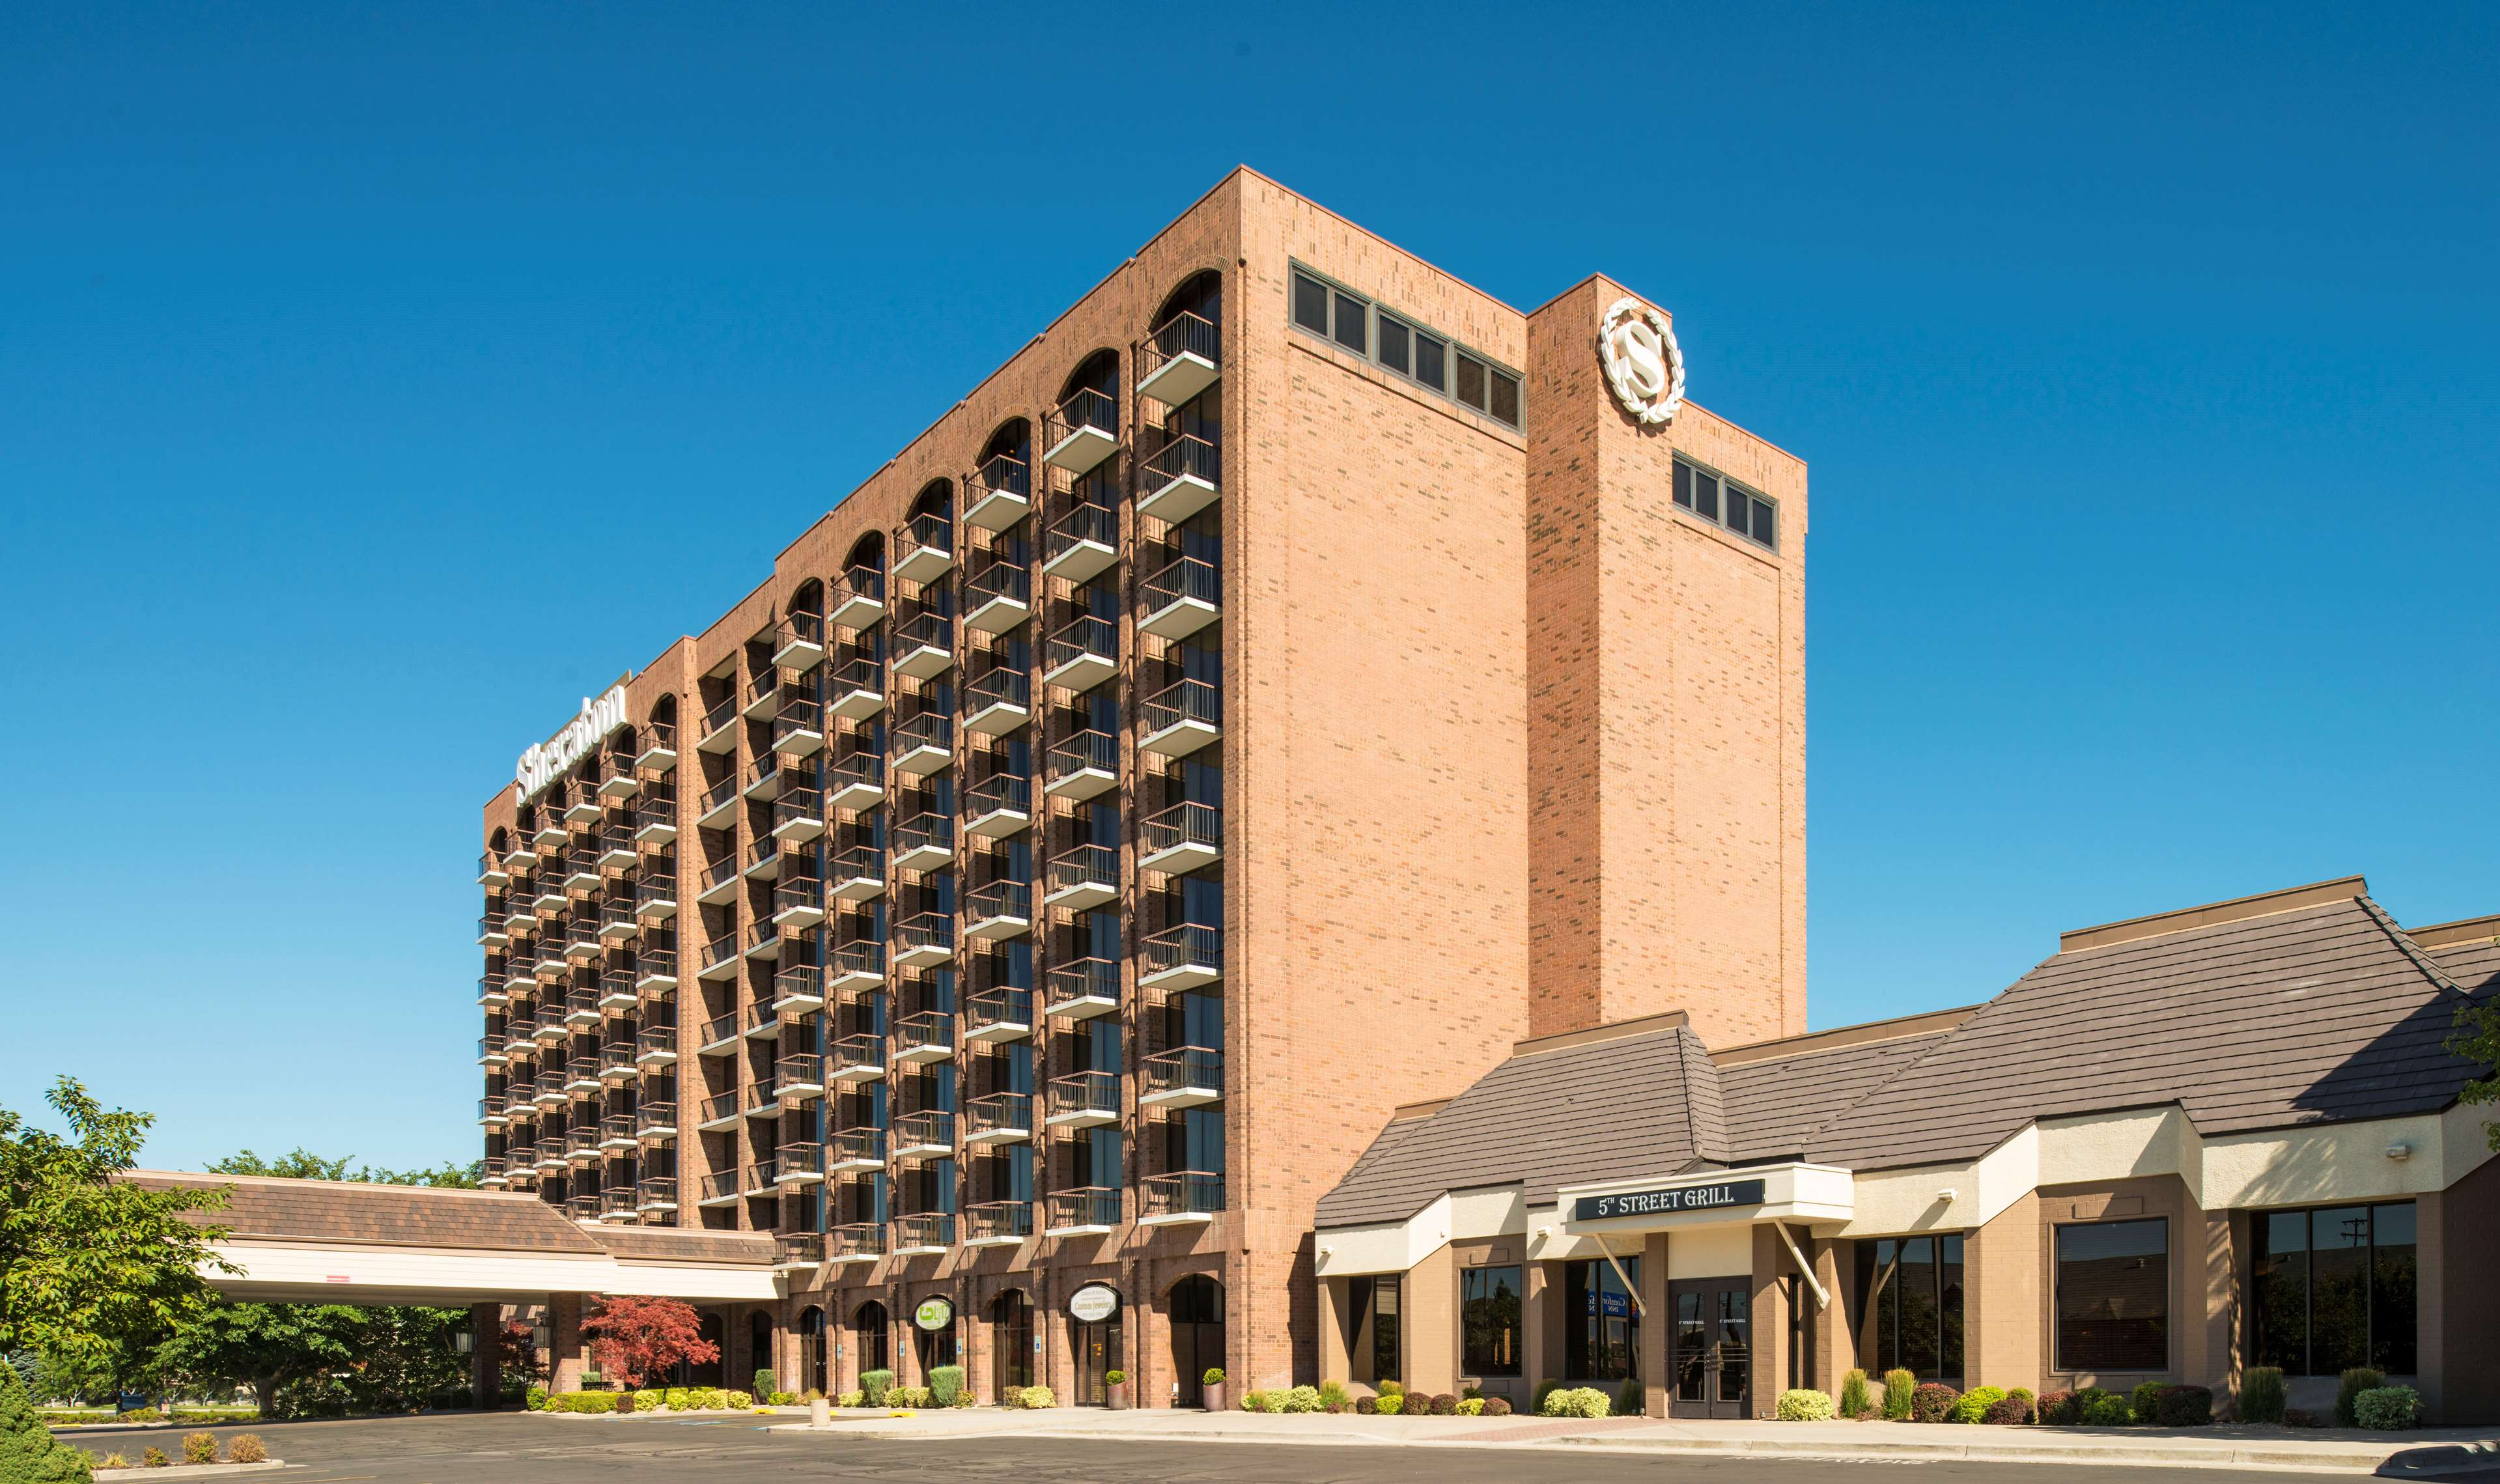 Sheraton Salt Lake City Hotel At 150 West 500 South Salt Lake City Ut On Fave